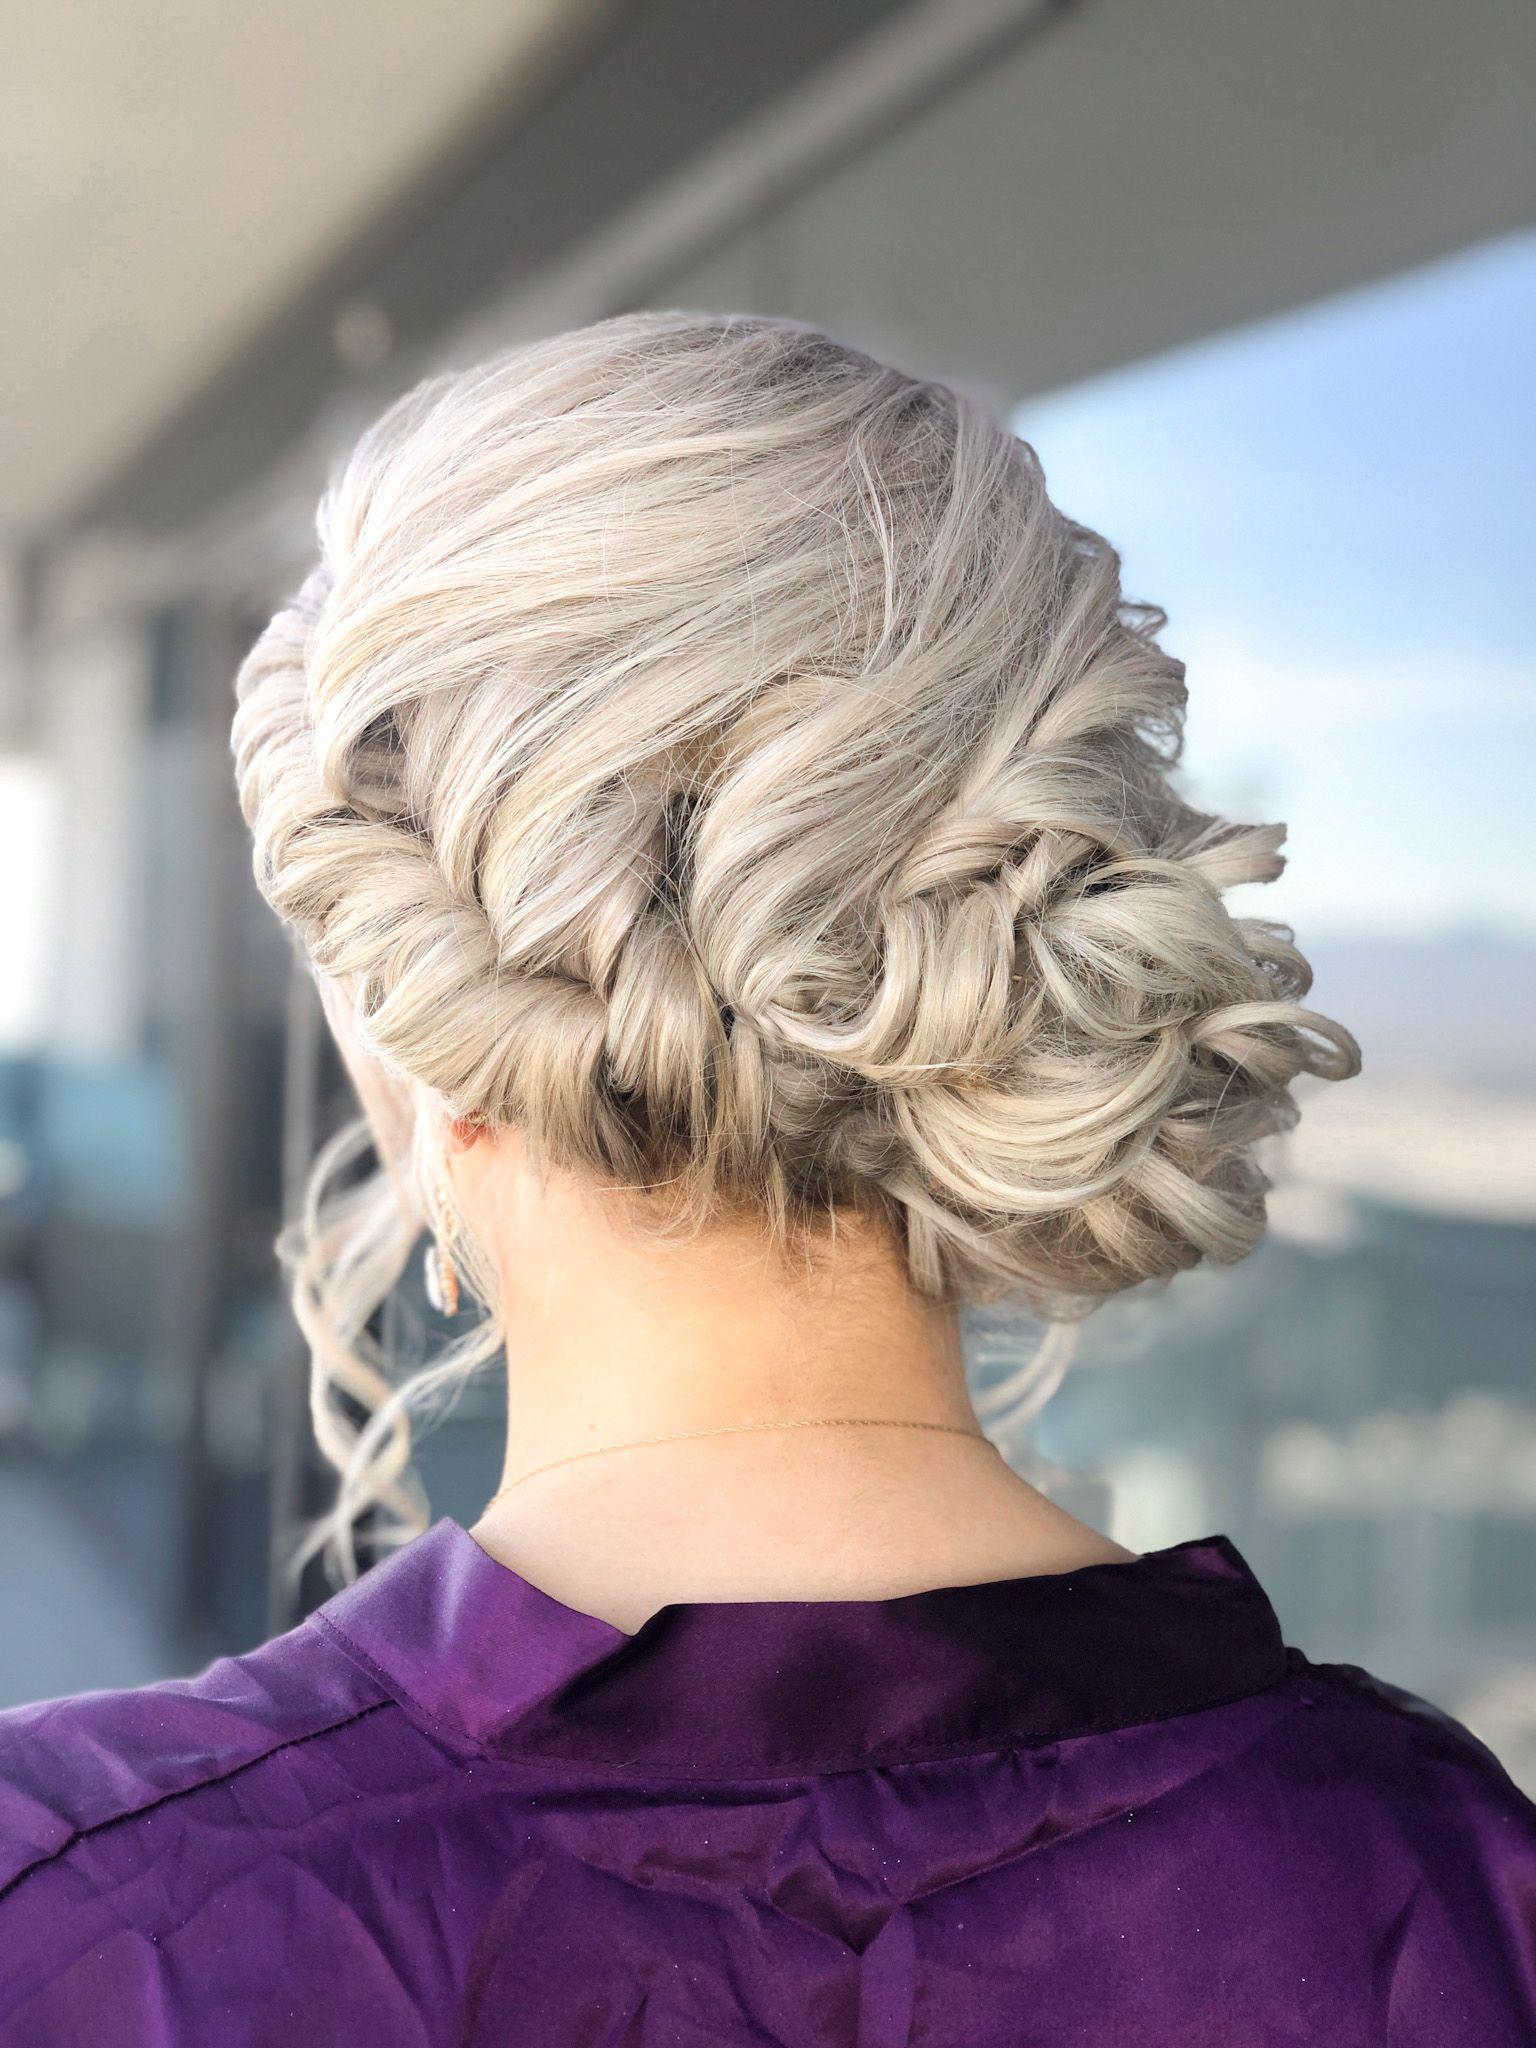 Braided low updo in 2020 vegas hair mobile hair